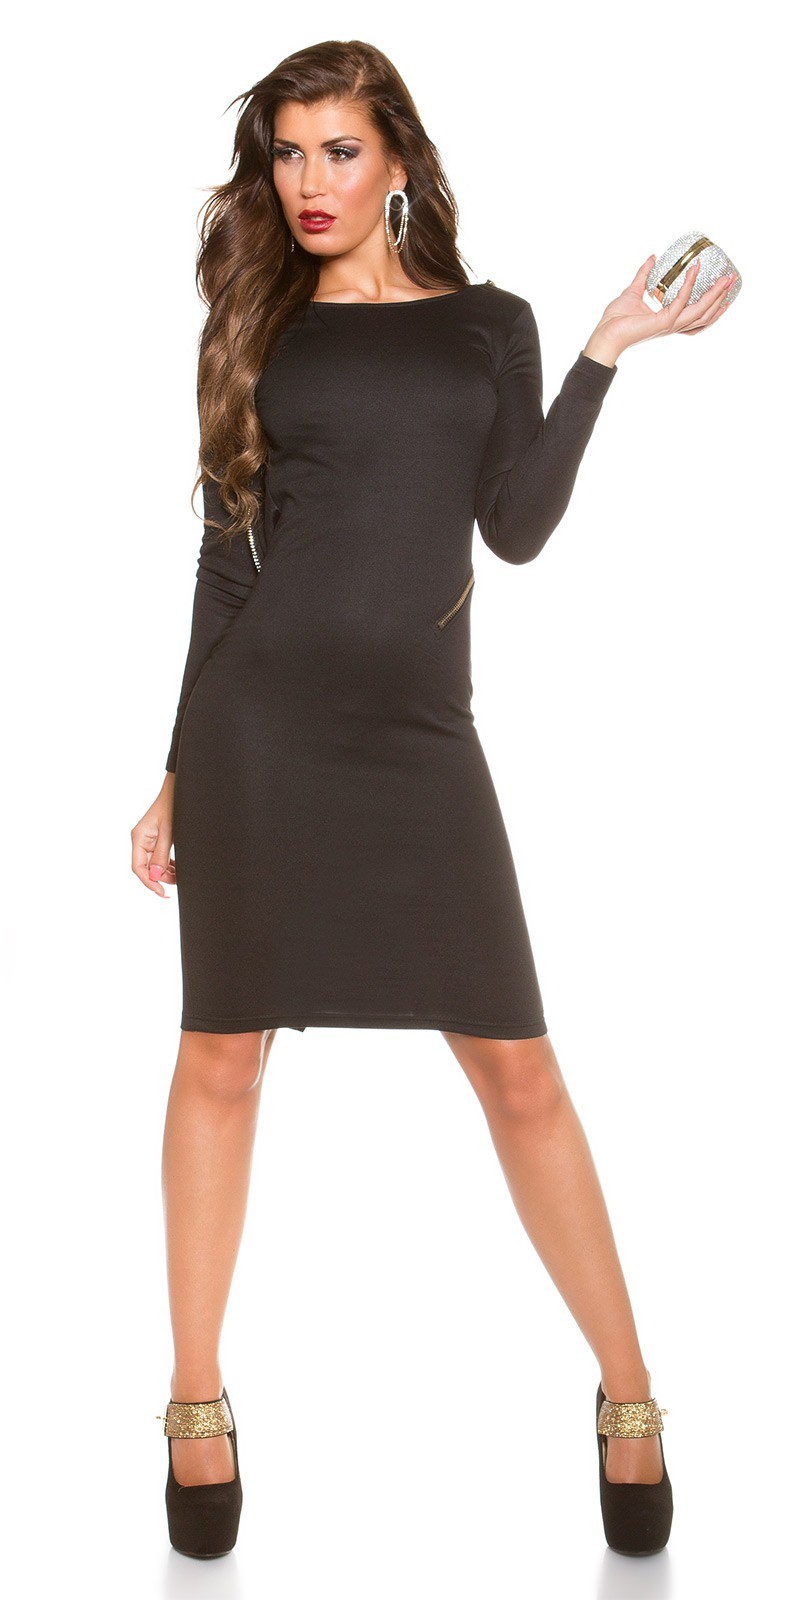 7651f994d98d Šaty s holým chrbtom KouCla Black – Sissy Boutique